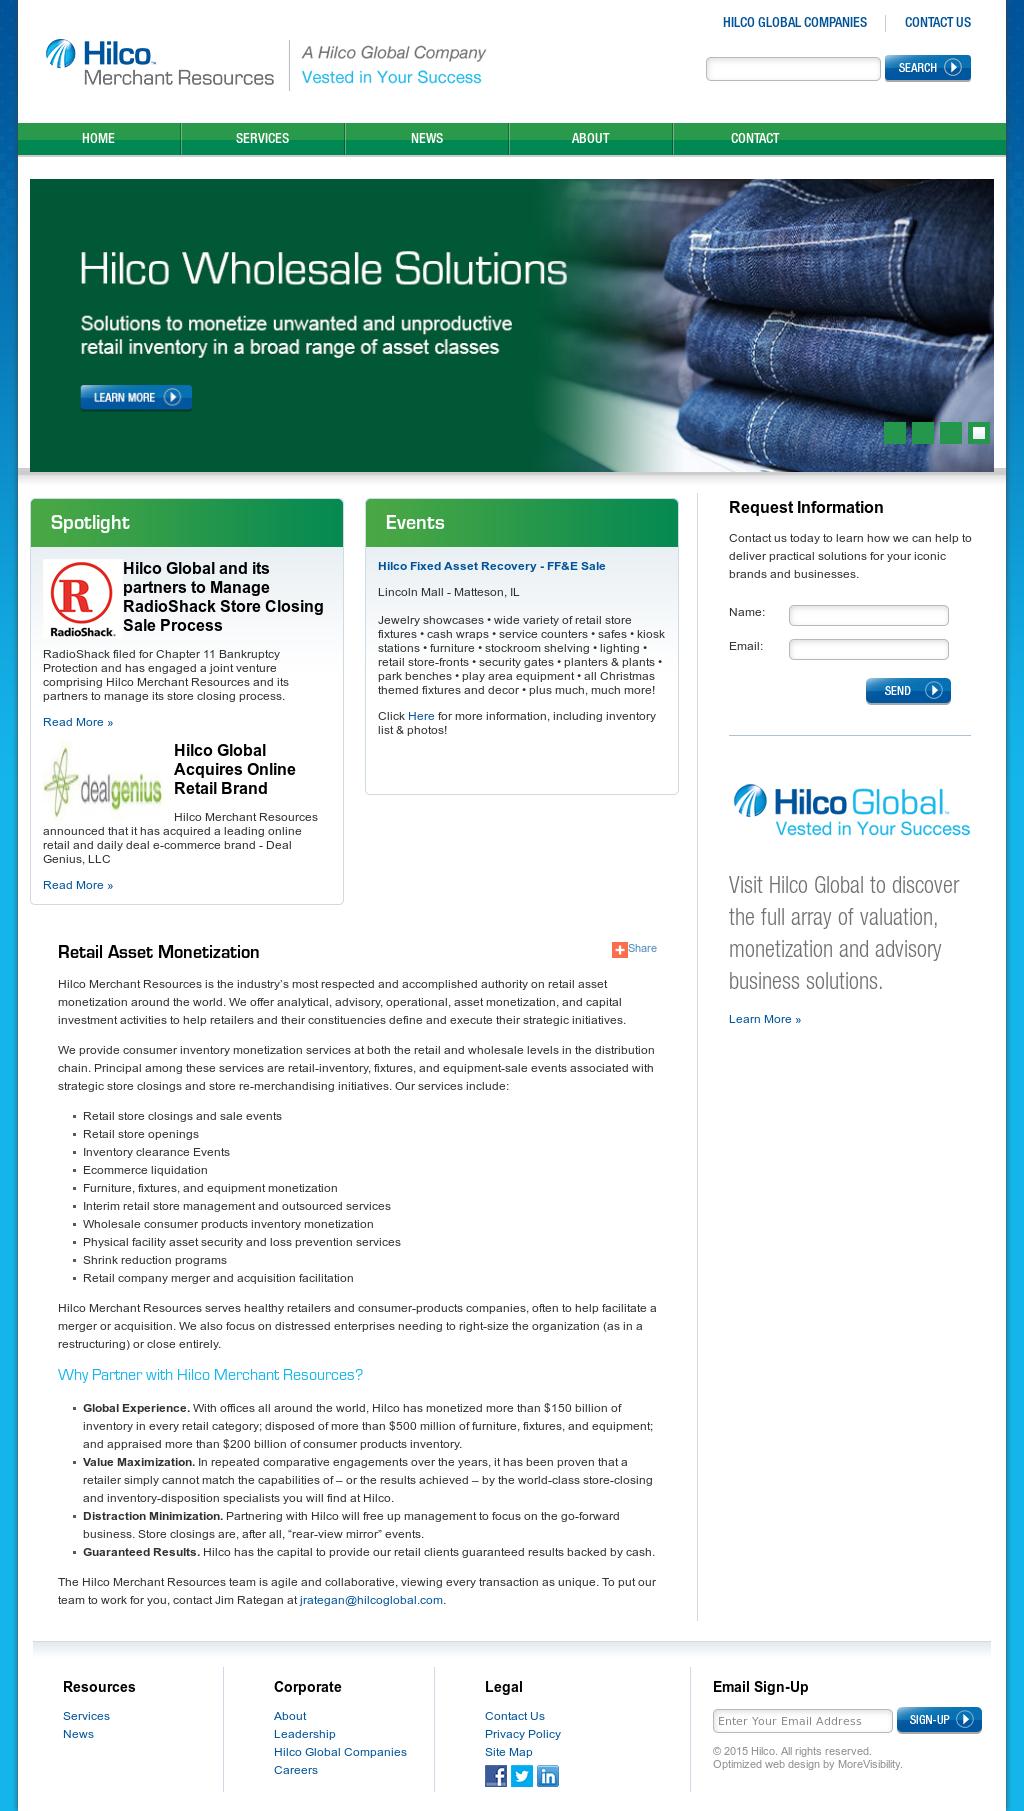 de02b4690ff Hilcomerchantresources Competitors, Revenue and Employees - Owler Company  Profile